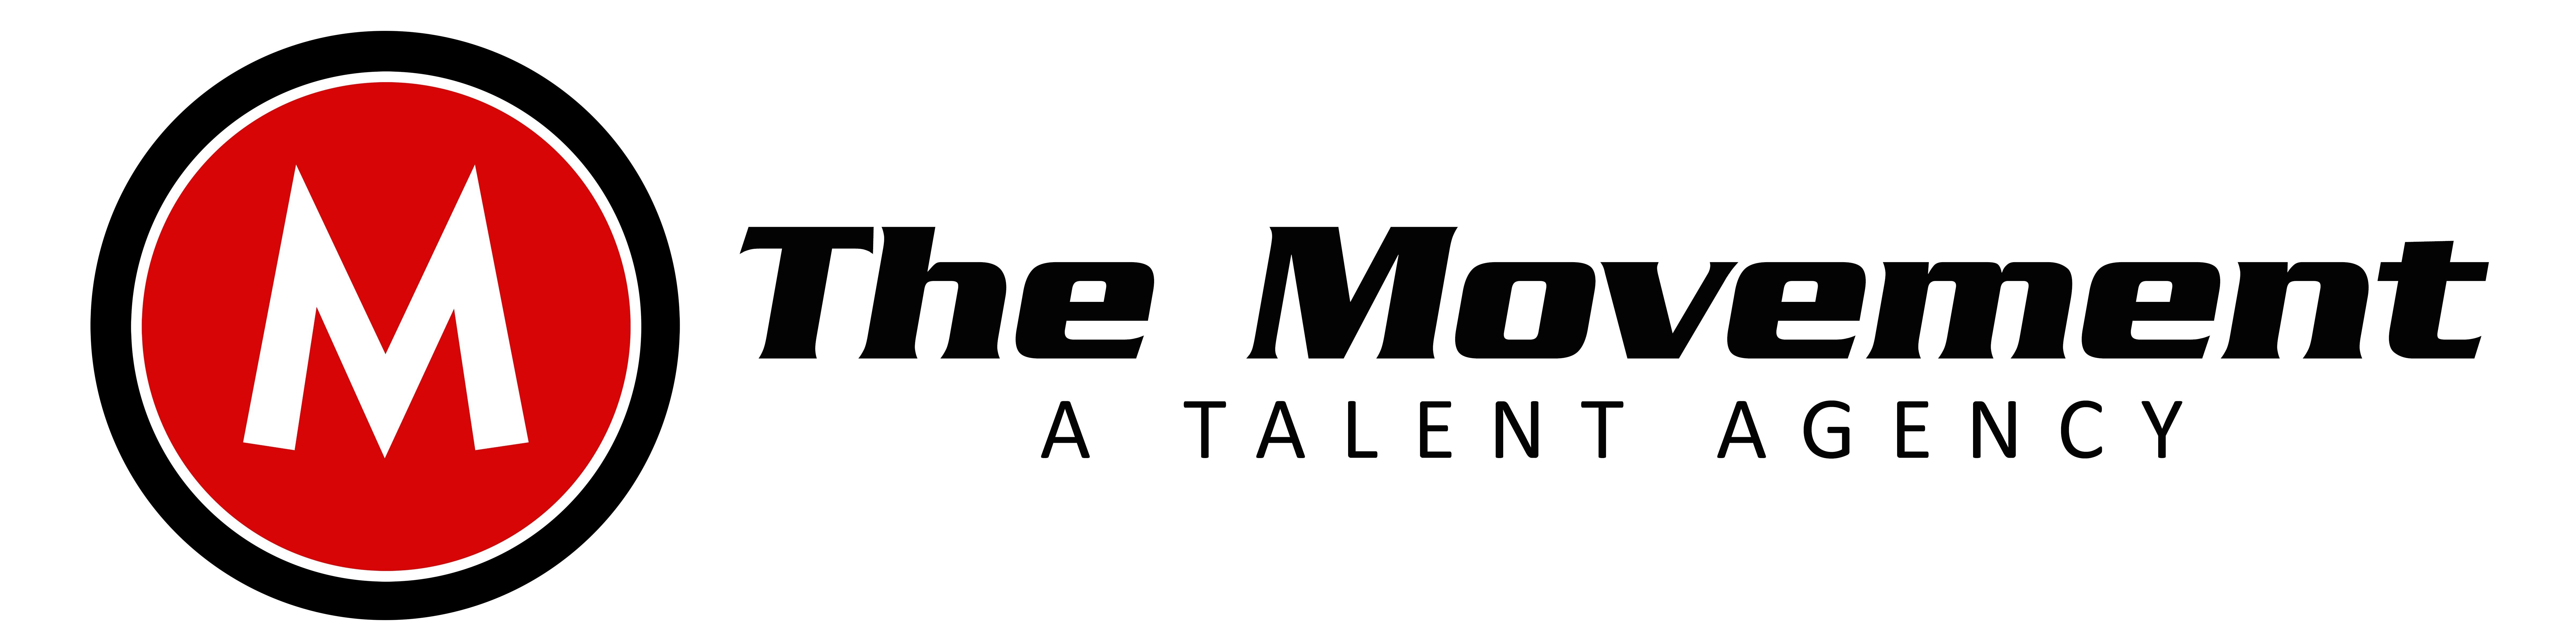 Movement Talent Agency (MTA) | LinkedIn